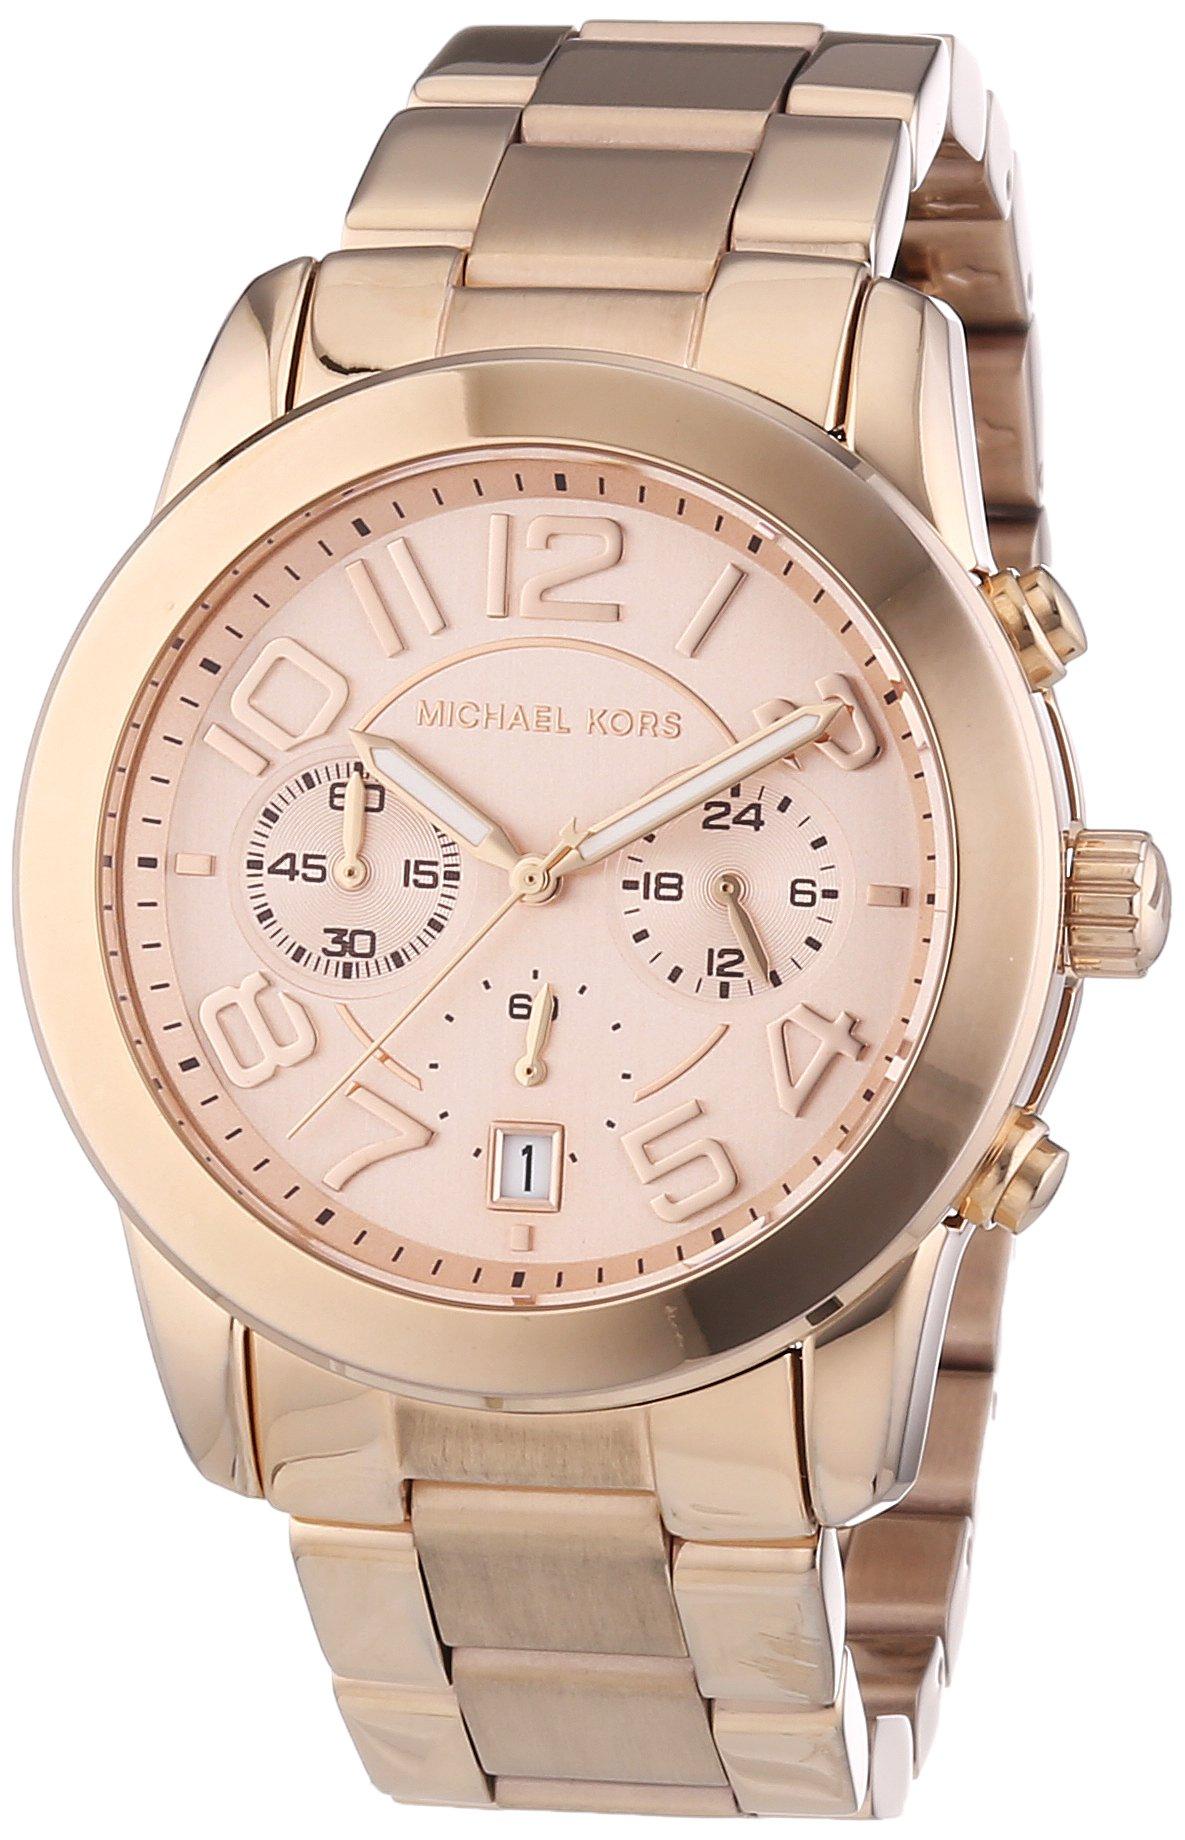 Michael Kors MK5727 Women's Mercer Rose Gold-Tone Stainless Steel Bracelet Chronograph Watch by Michael Kors